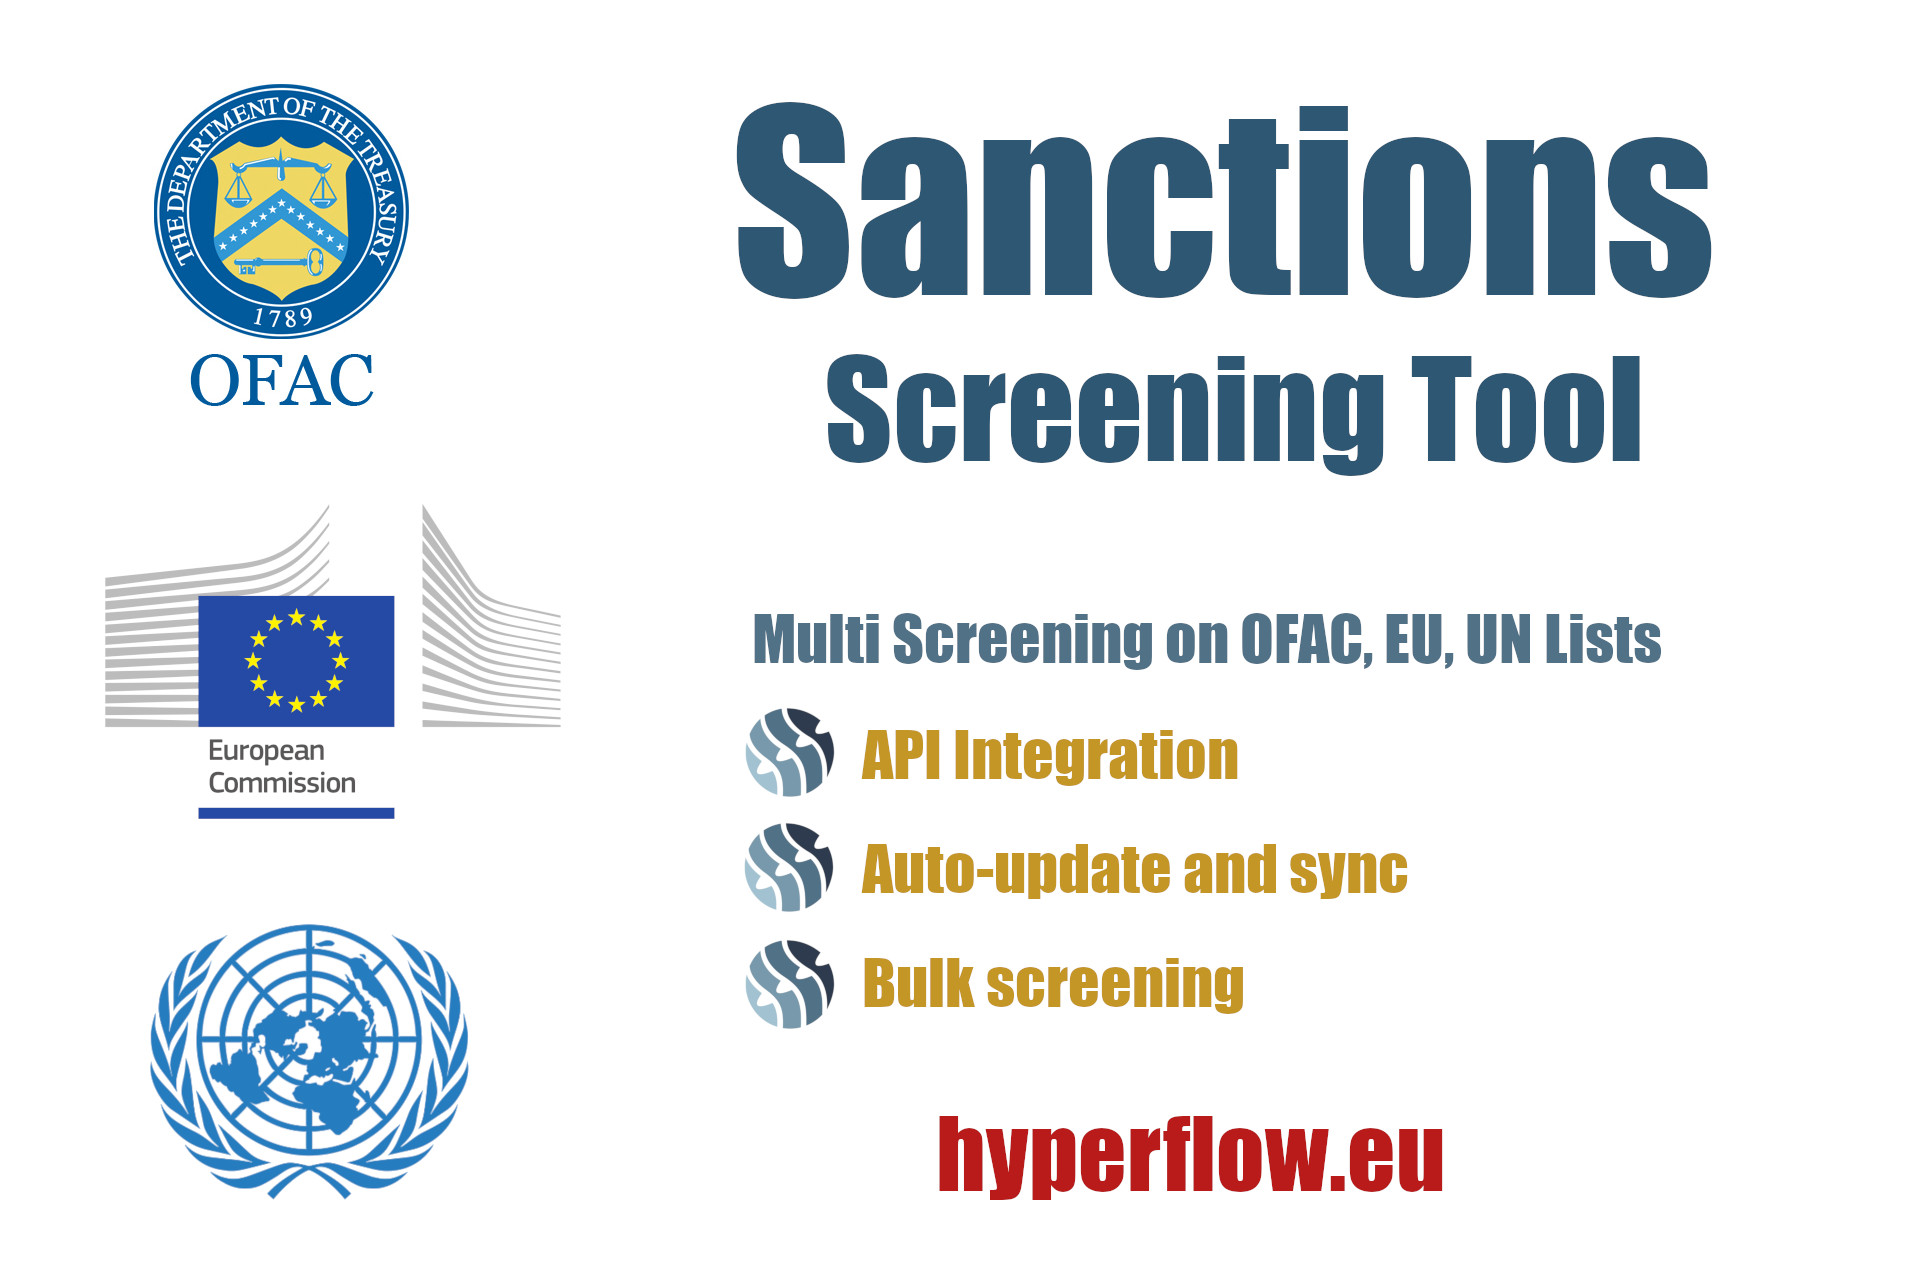 Sanctions Screening complete tool